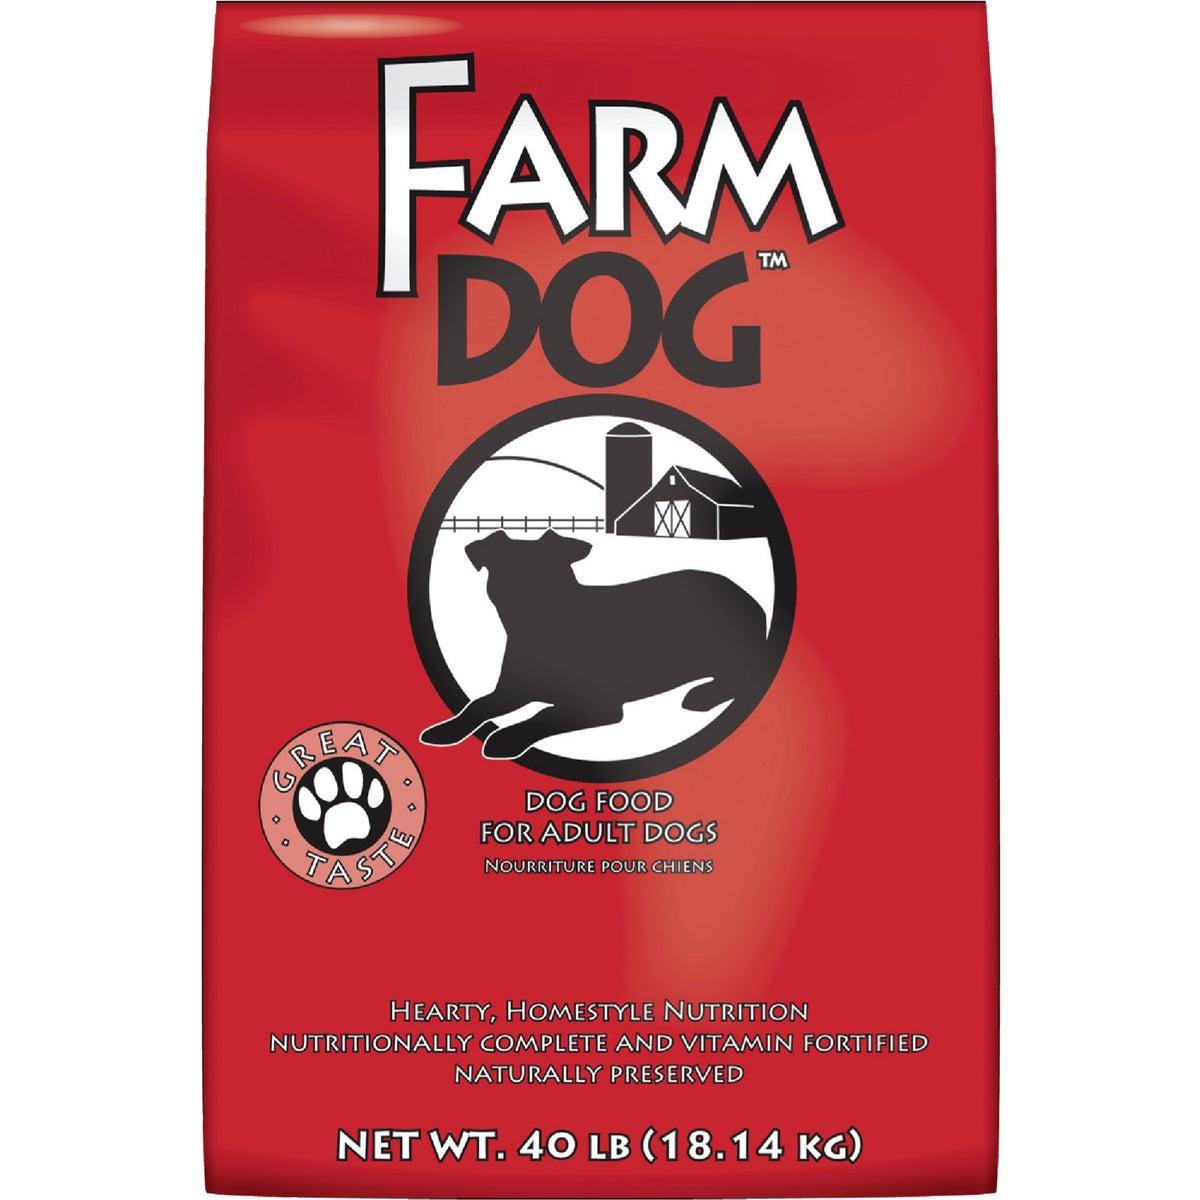 40LB FARM DOG FOOD - 7852 by Kent Feeds Inc